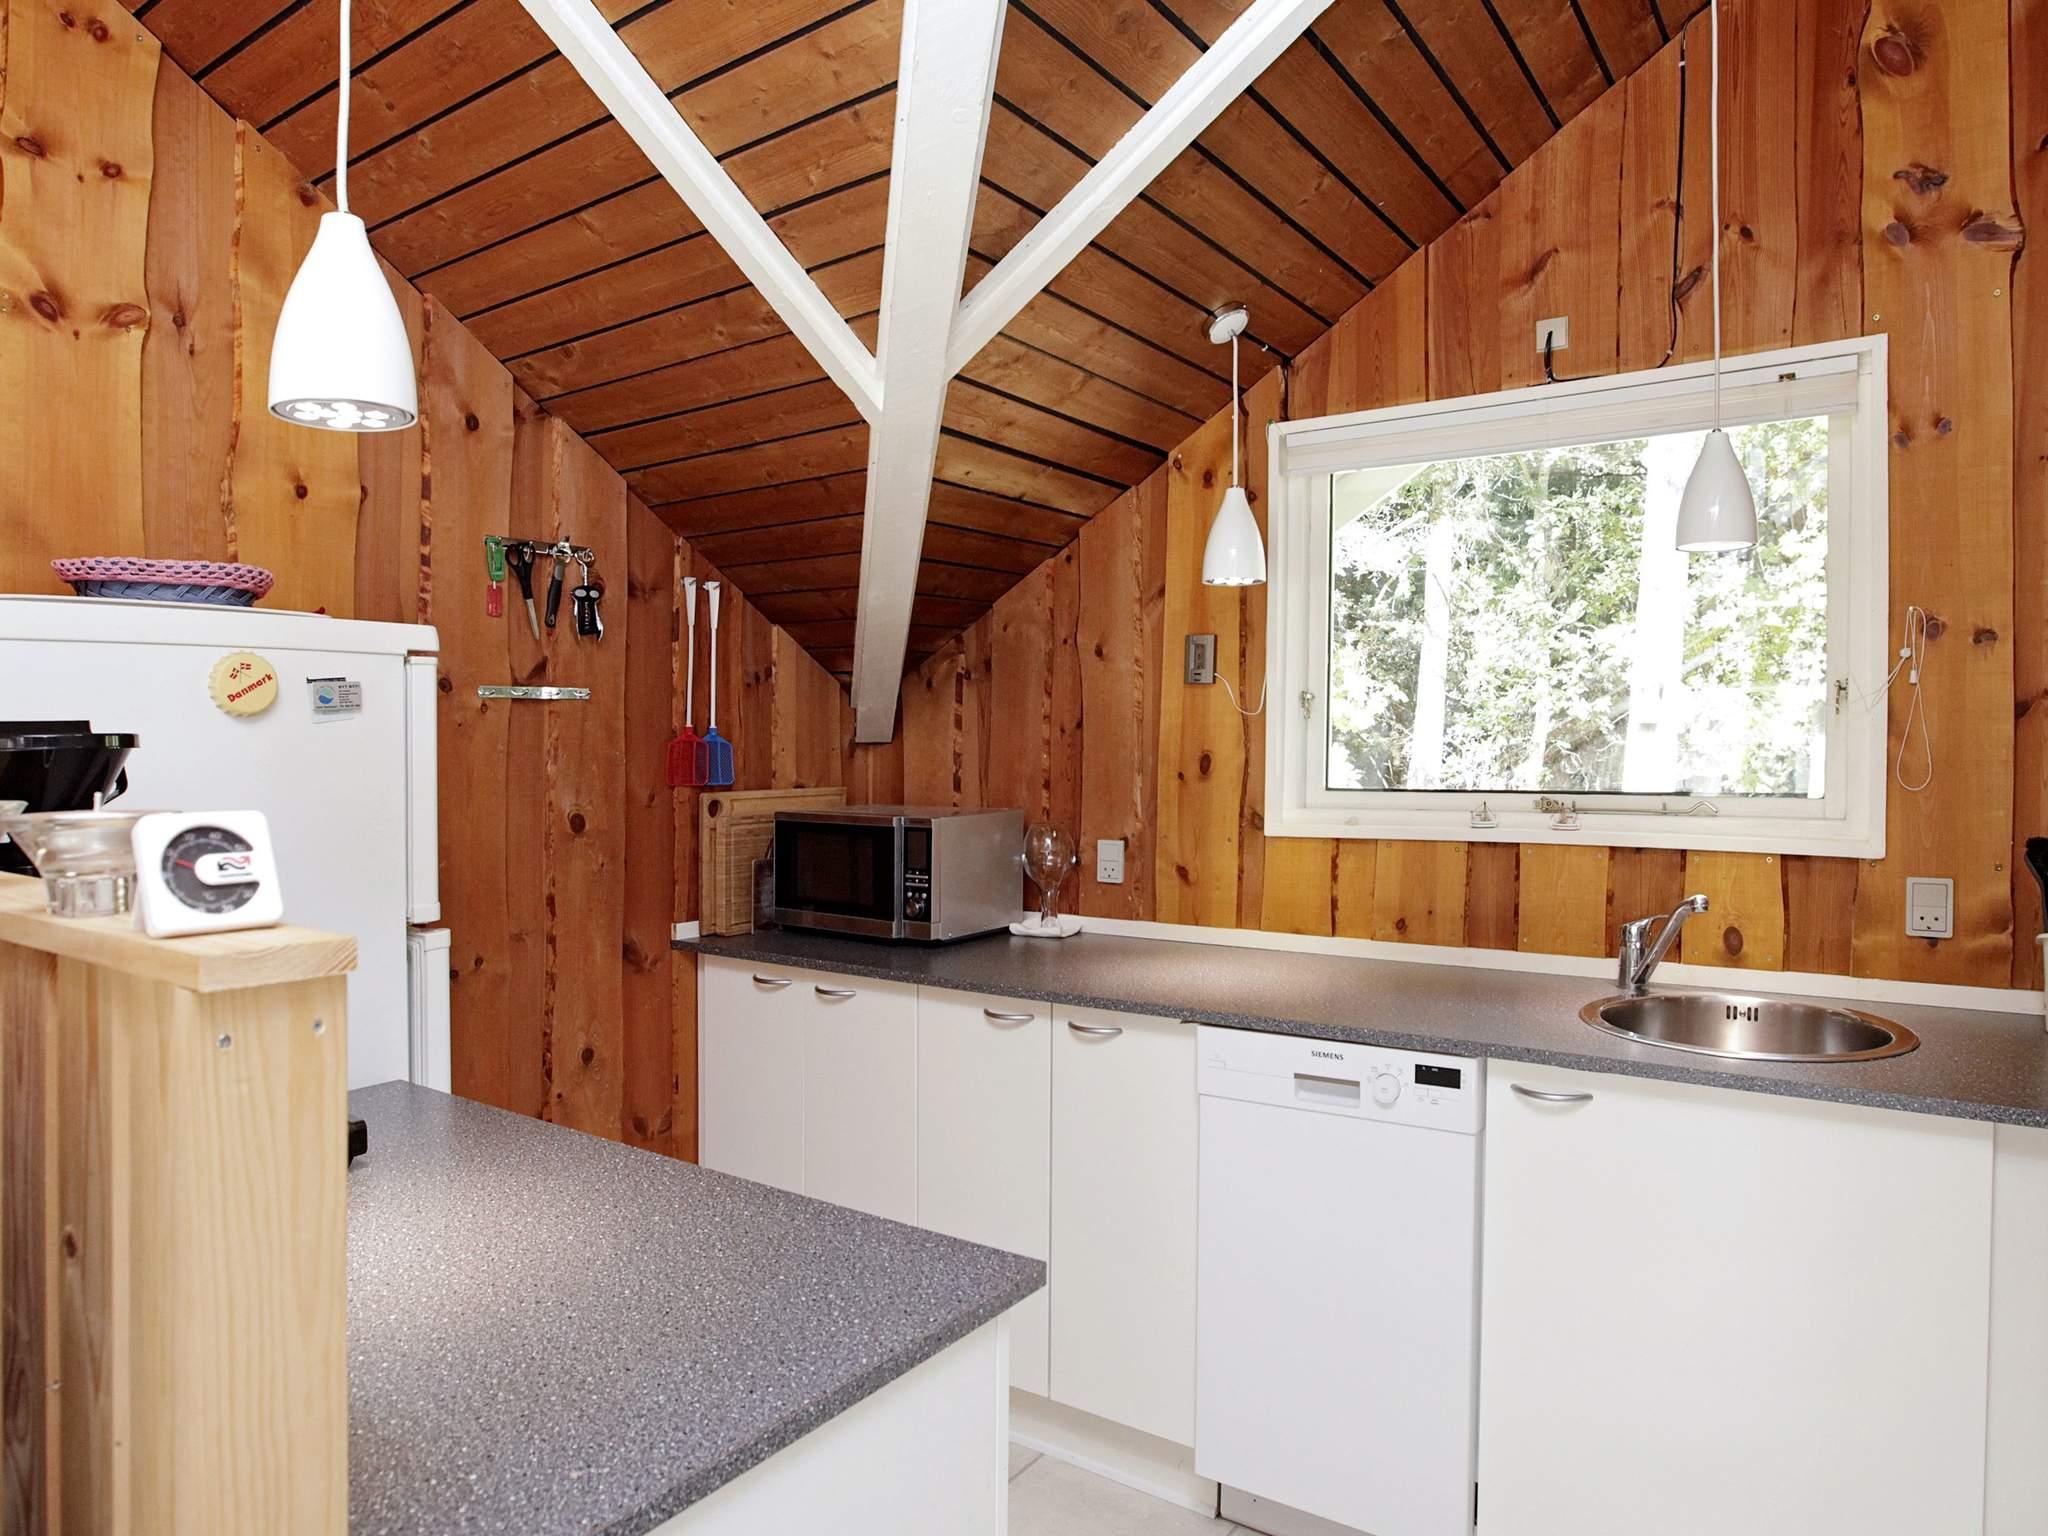 Ferienhaus Hou Nord/Melholt (88048), Hou, , Nordostjütland, Dänemark, Bild 15